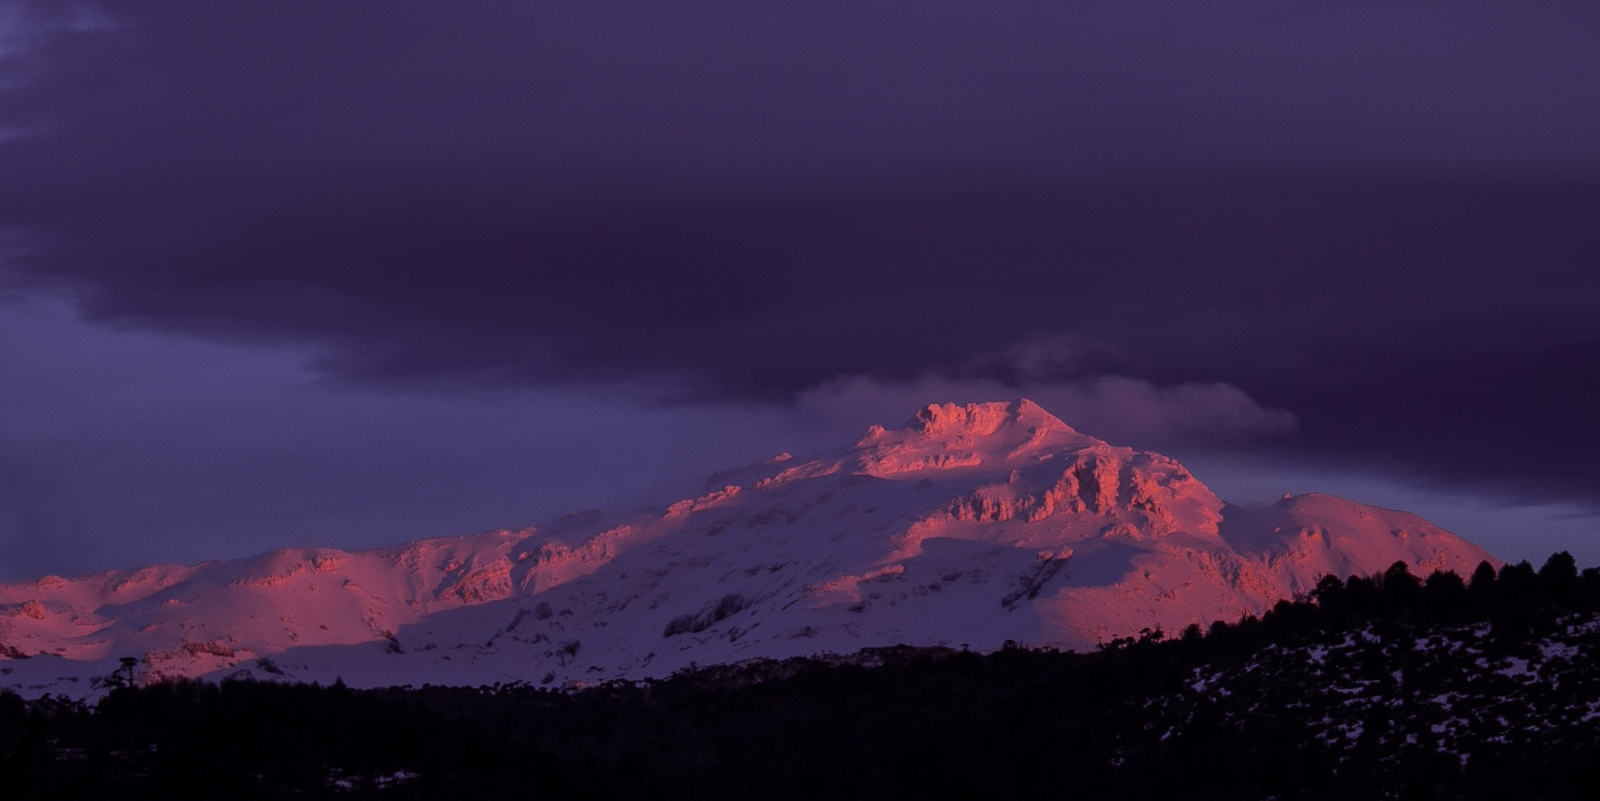 Sierra Nevada, desde Suizandina Lodge, Corralco (Lonquimay)